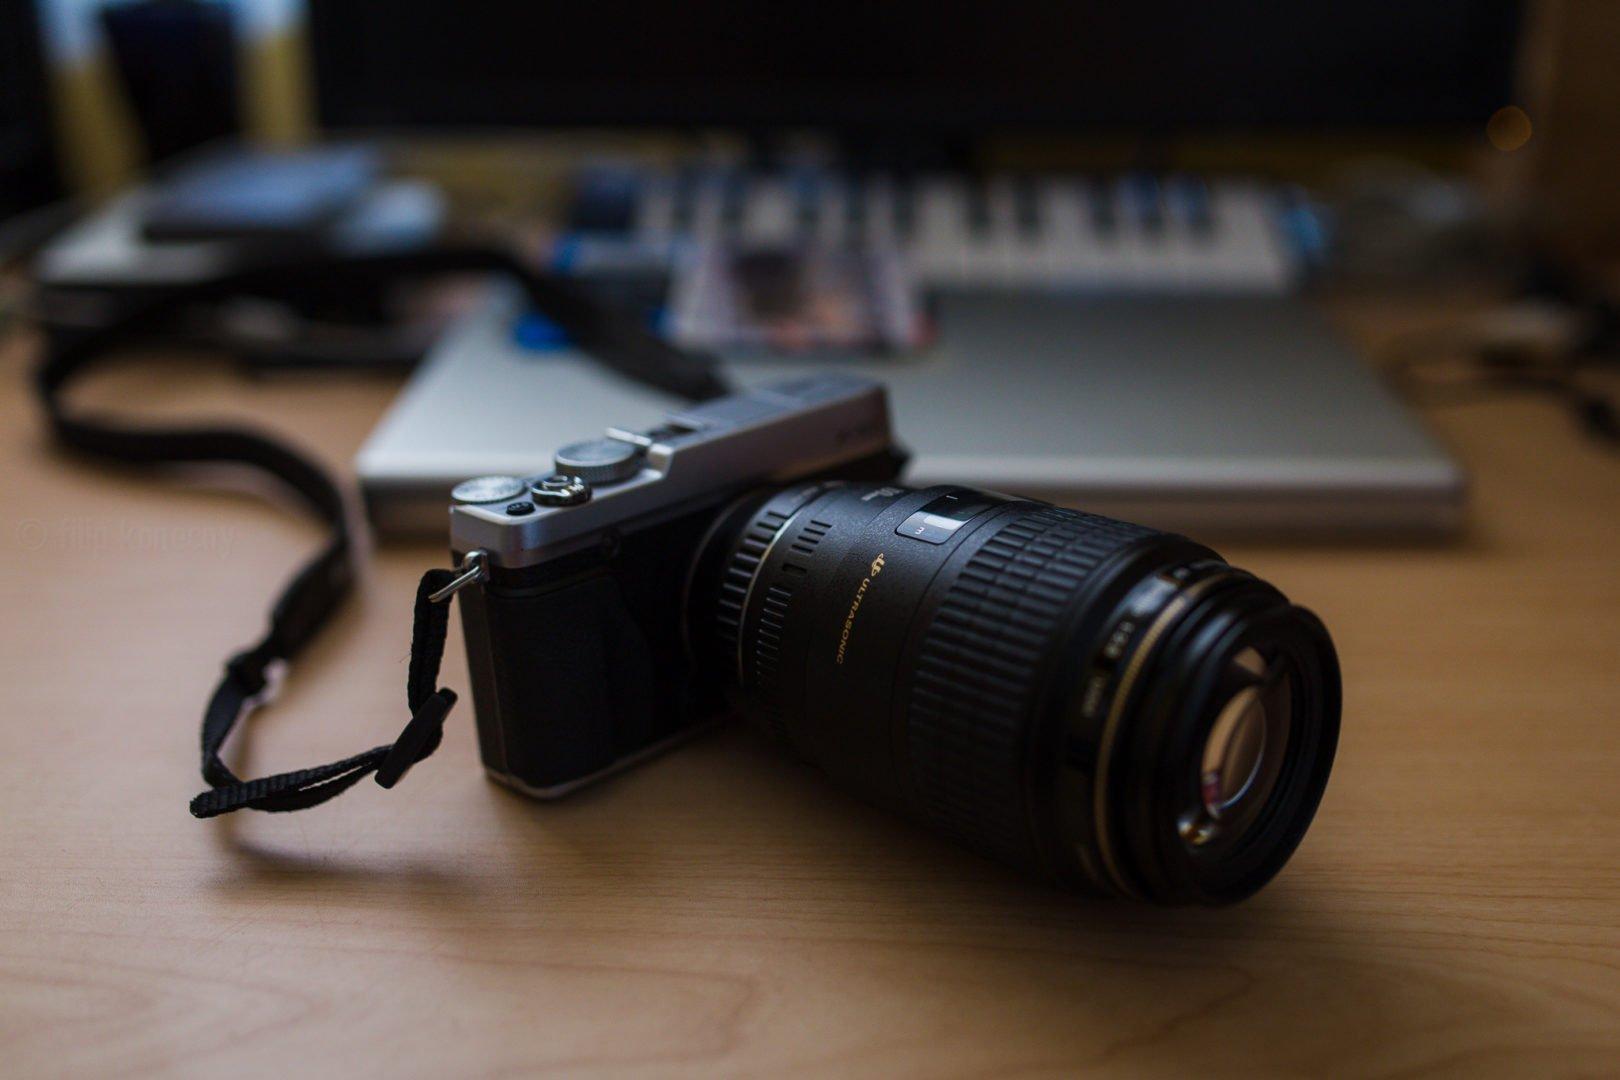 canon lens on fujifilm camera